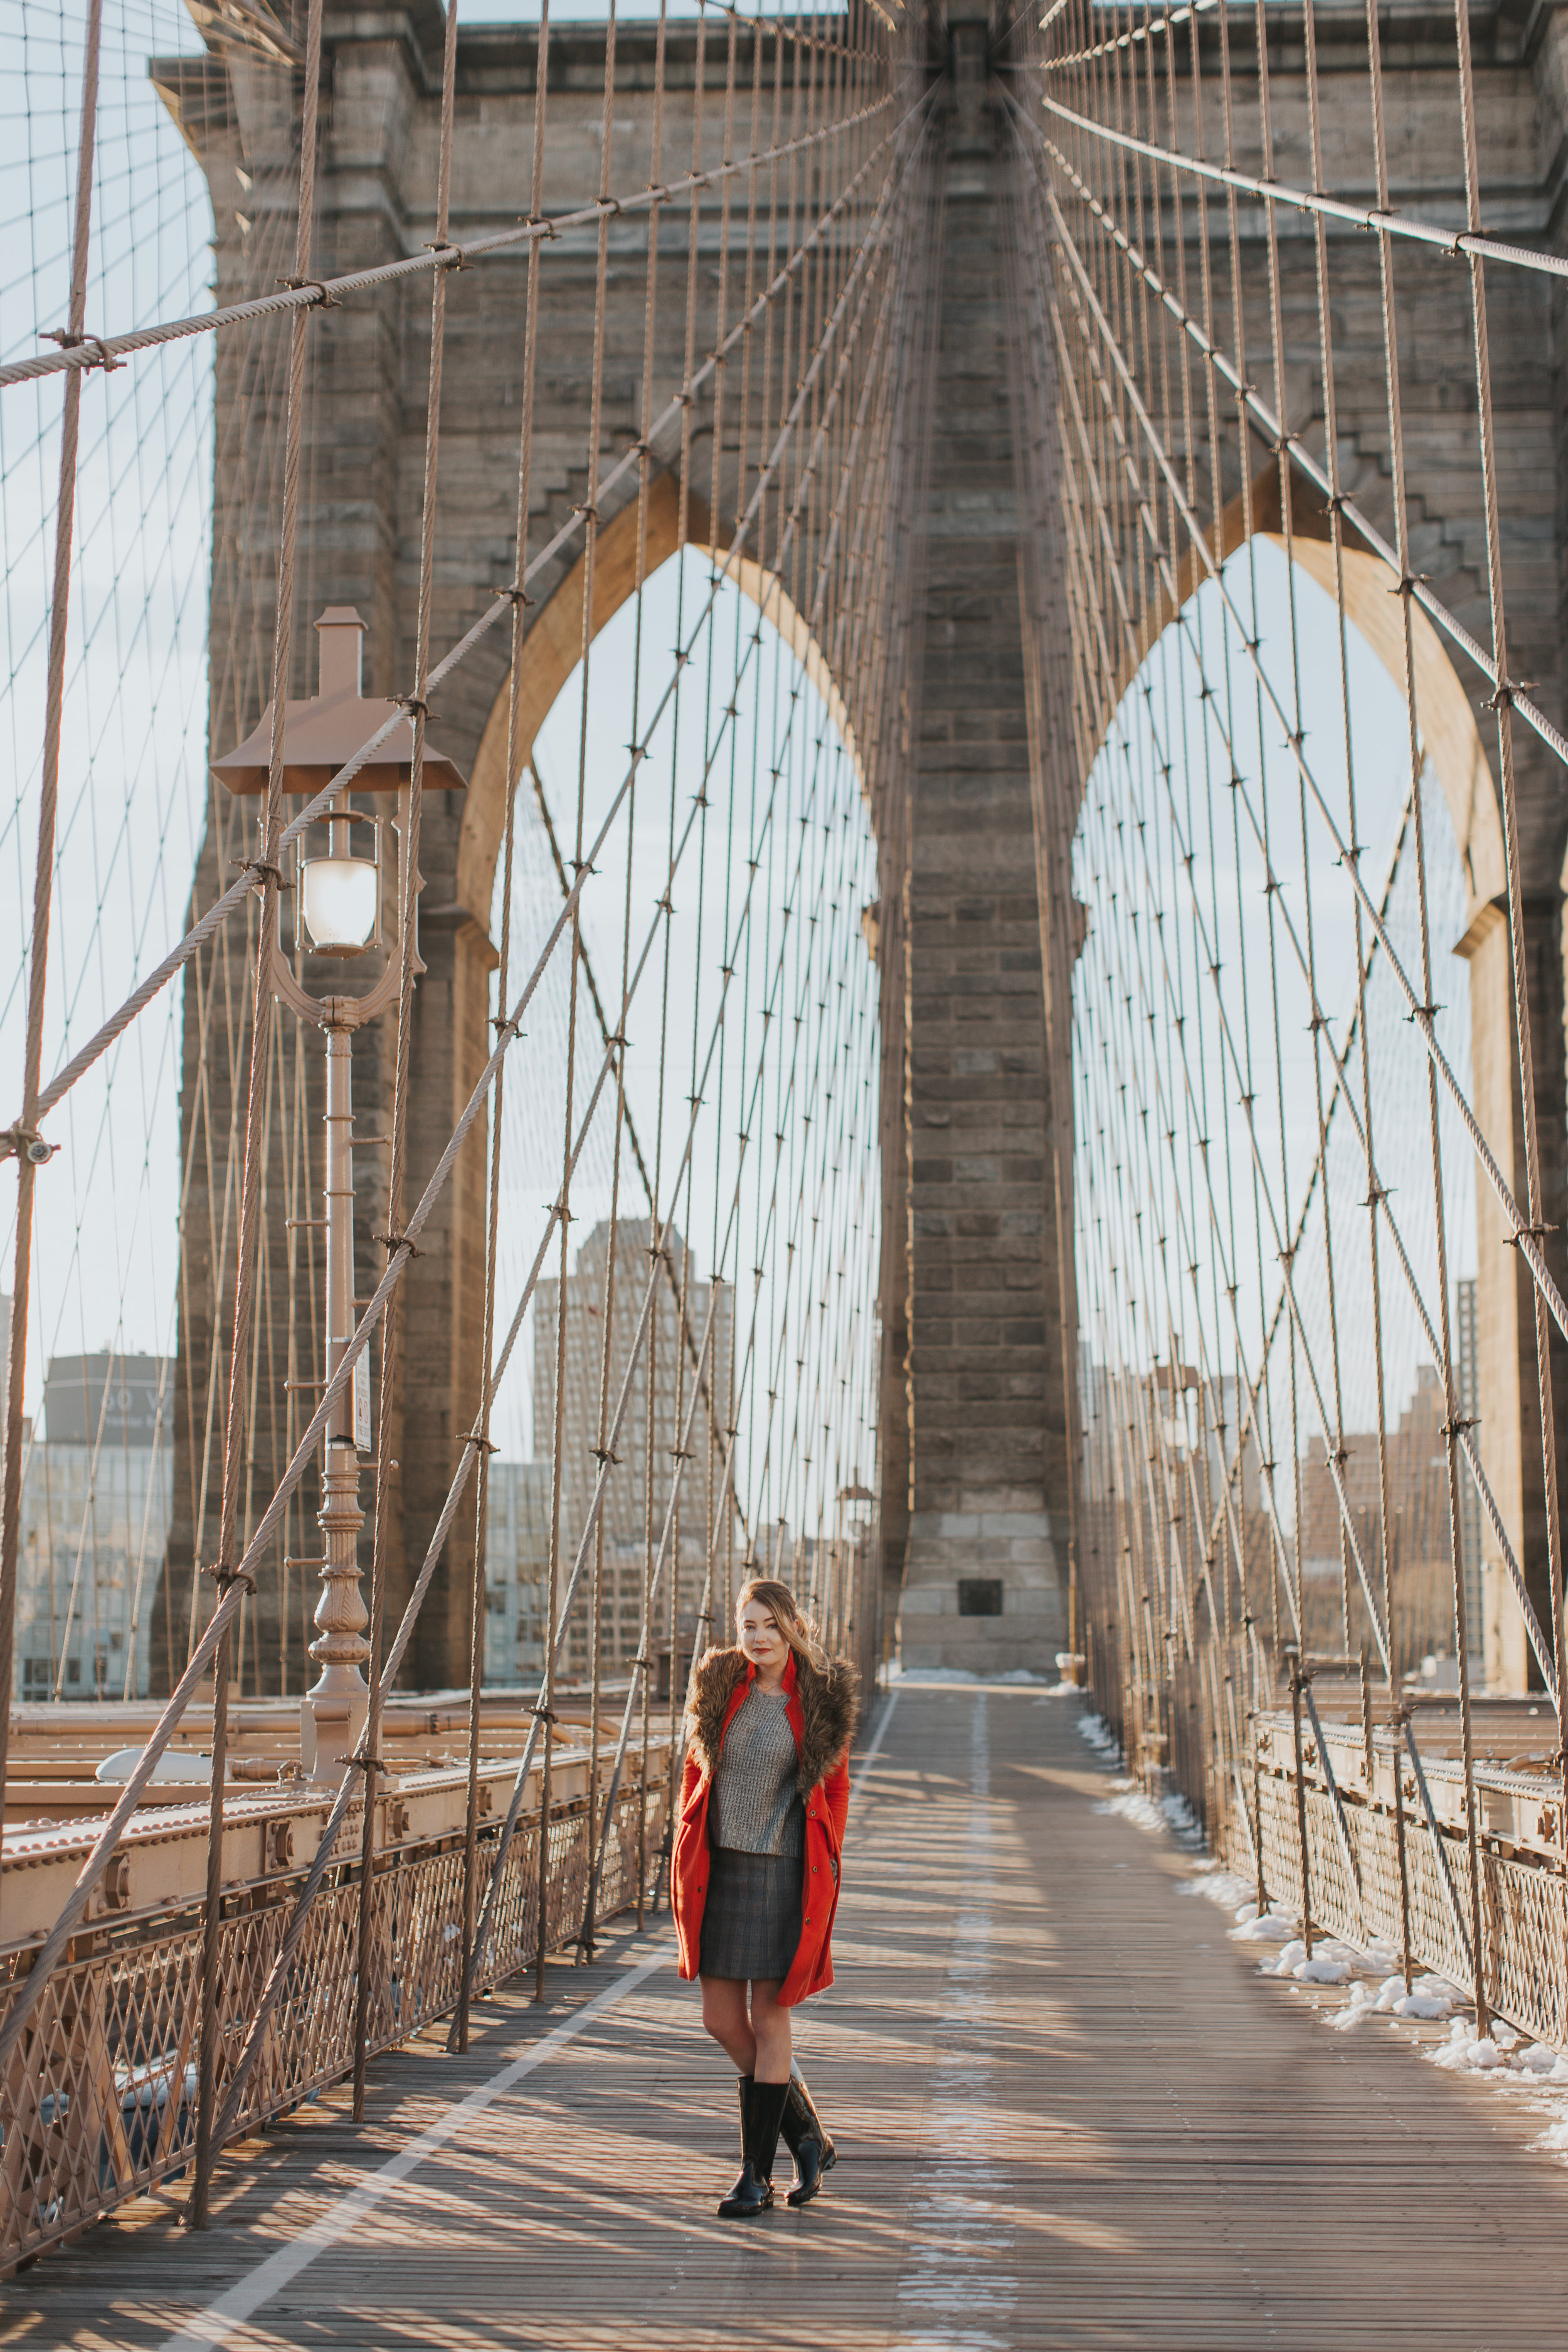 New York City portrait photographer, New york city wedding photographer, Brooklyn bridge portrait, brooklyn bridge photos, brooklyn bridge sunrise session, Brooklyn bridge inspiration512.JPG